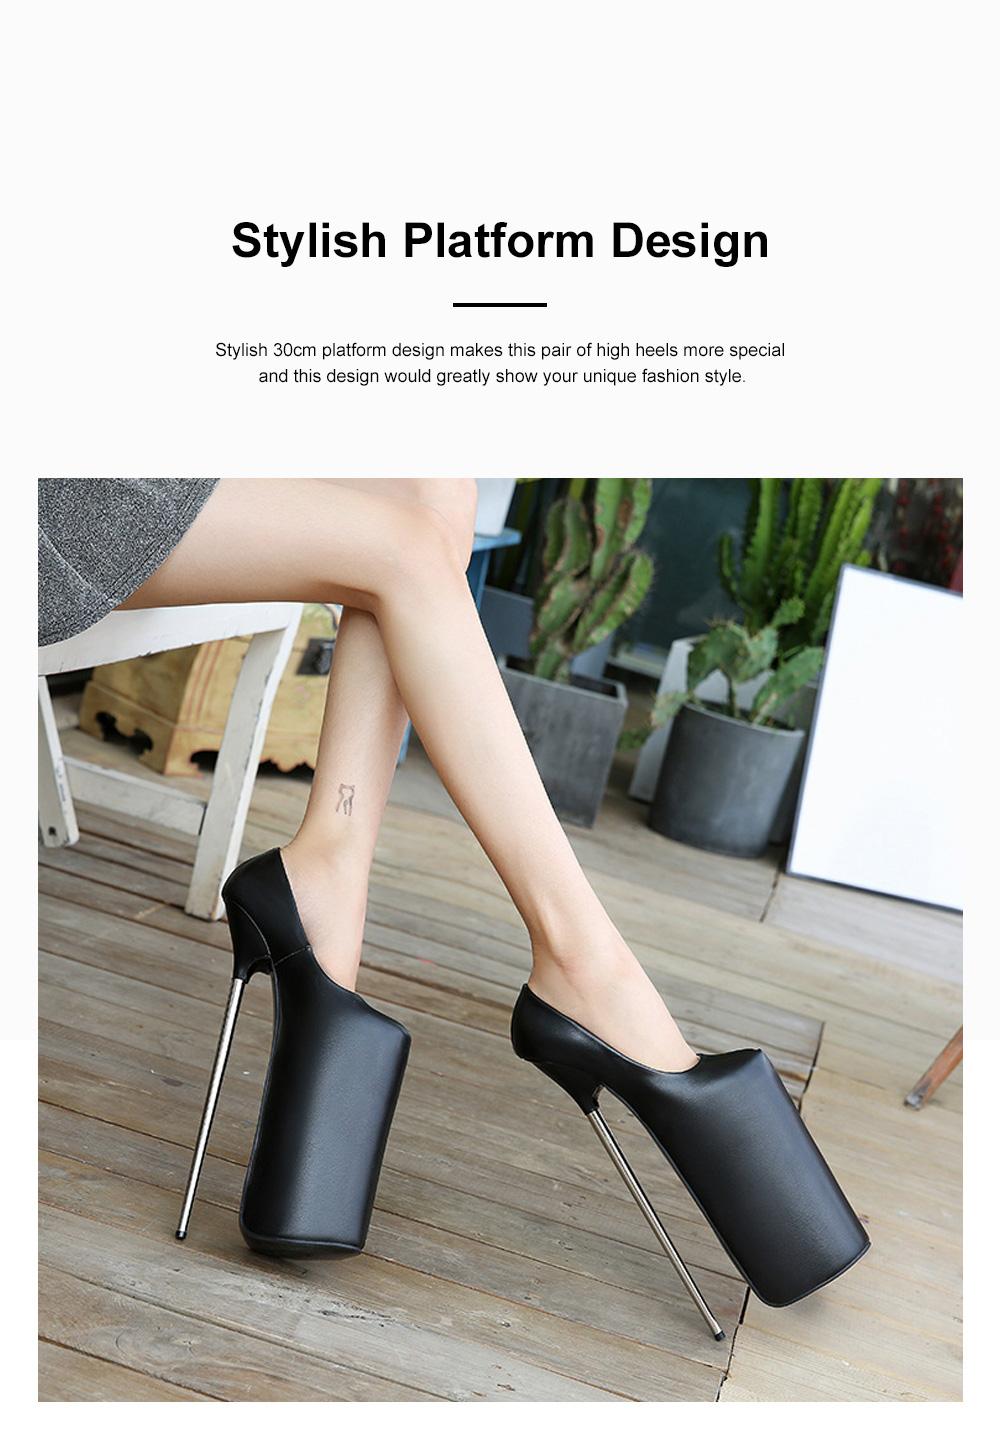 Stylish Sexy 30cm Platform Design High Heels Soft Skin-friendly PU Night Club Shoes with Anti-slip Rubber Sole Ins Hot 1